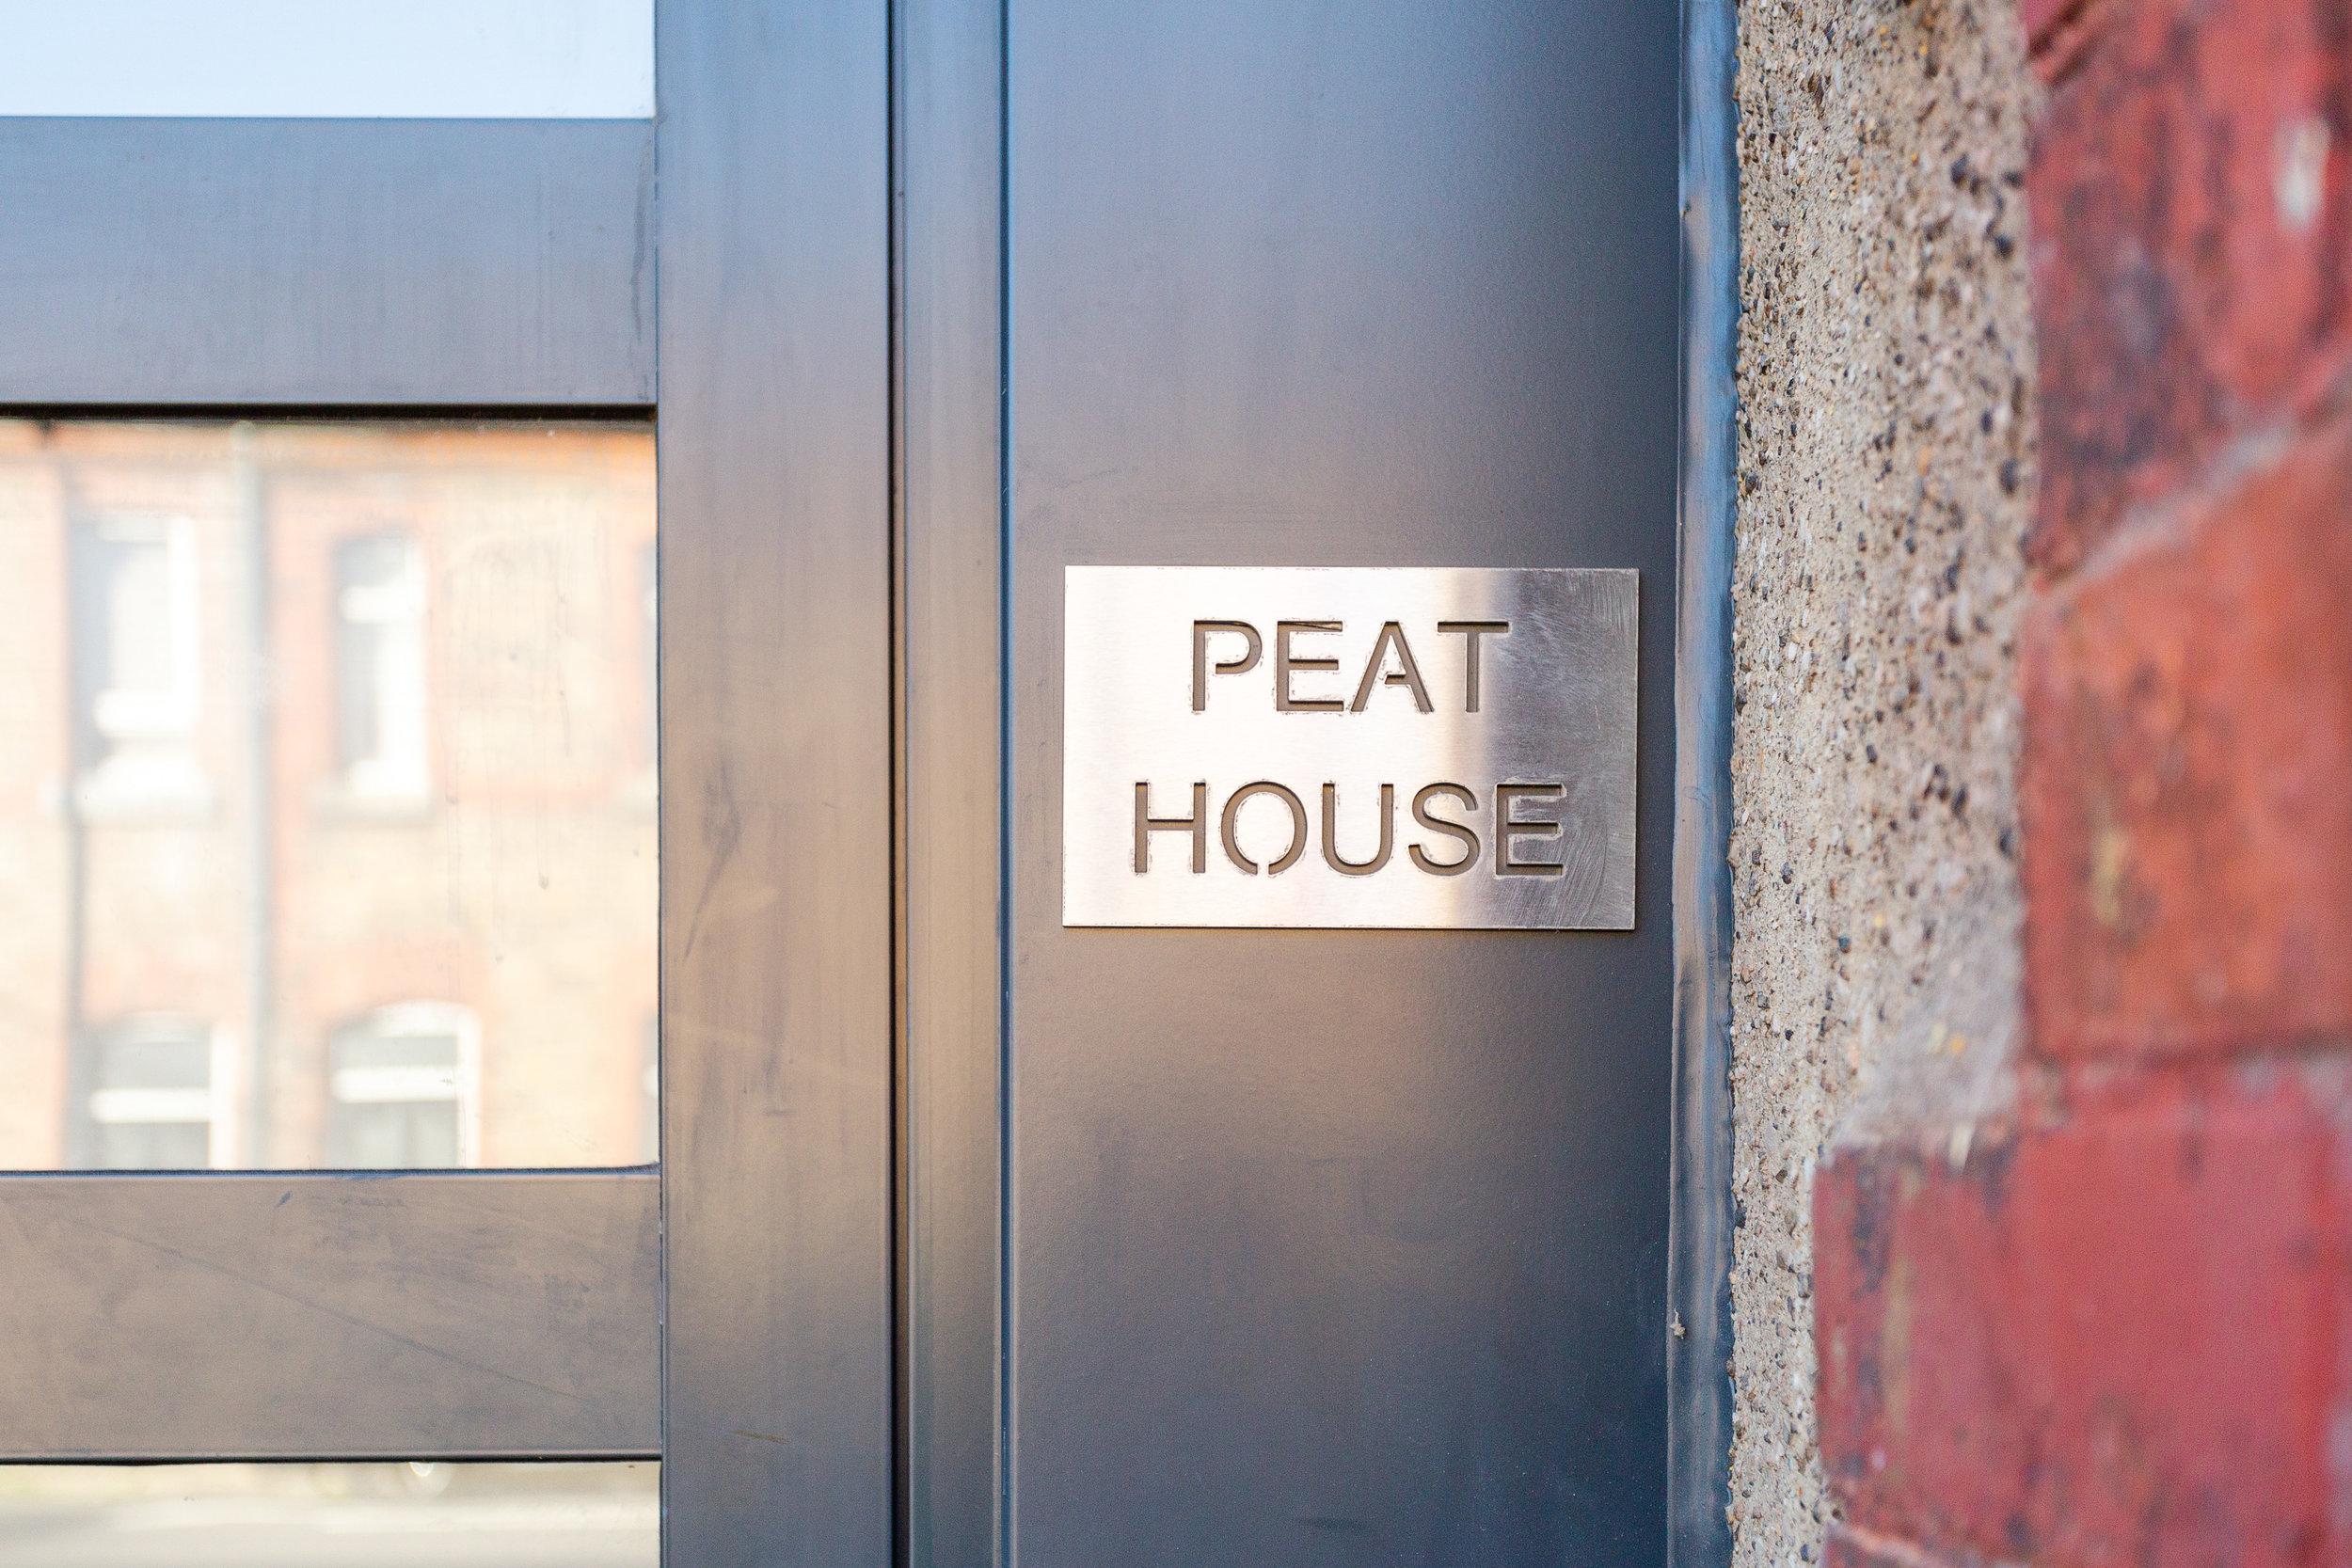 Beside64OxmantownRoad_1_peat house-1.jpg